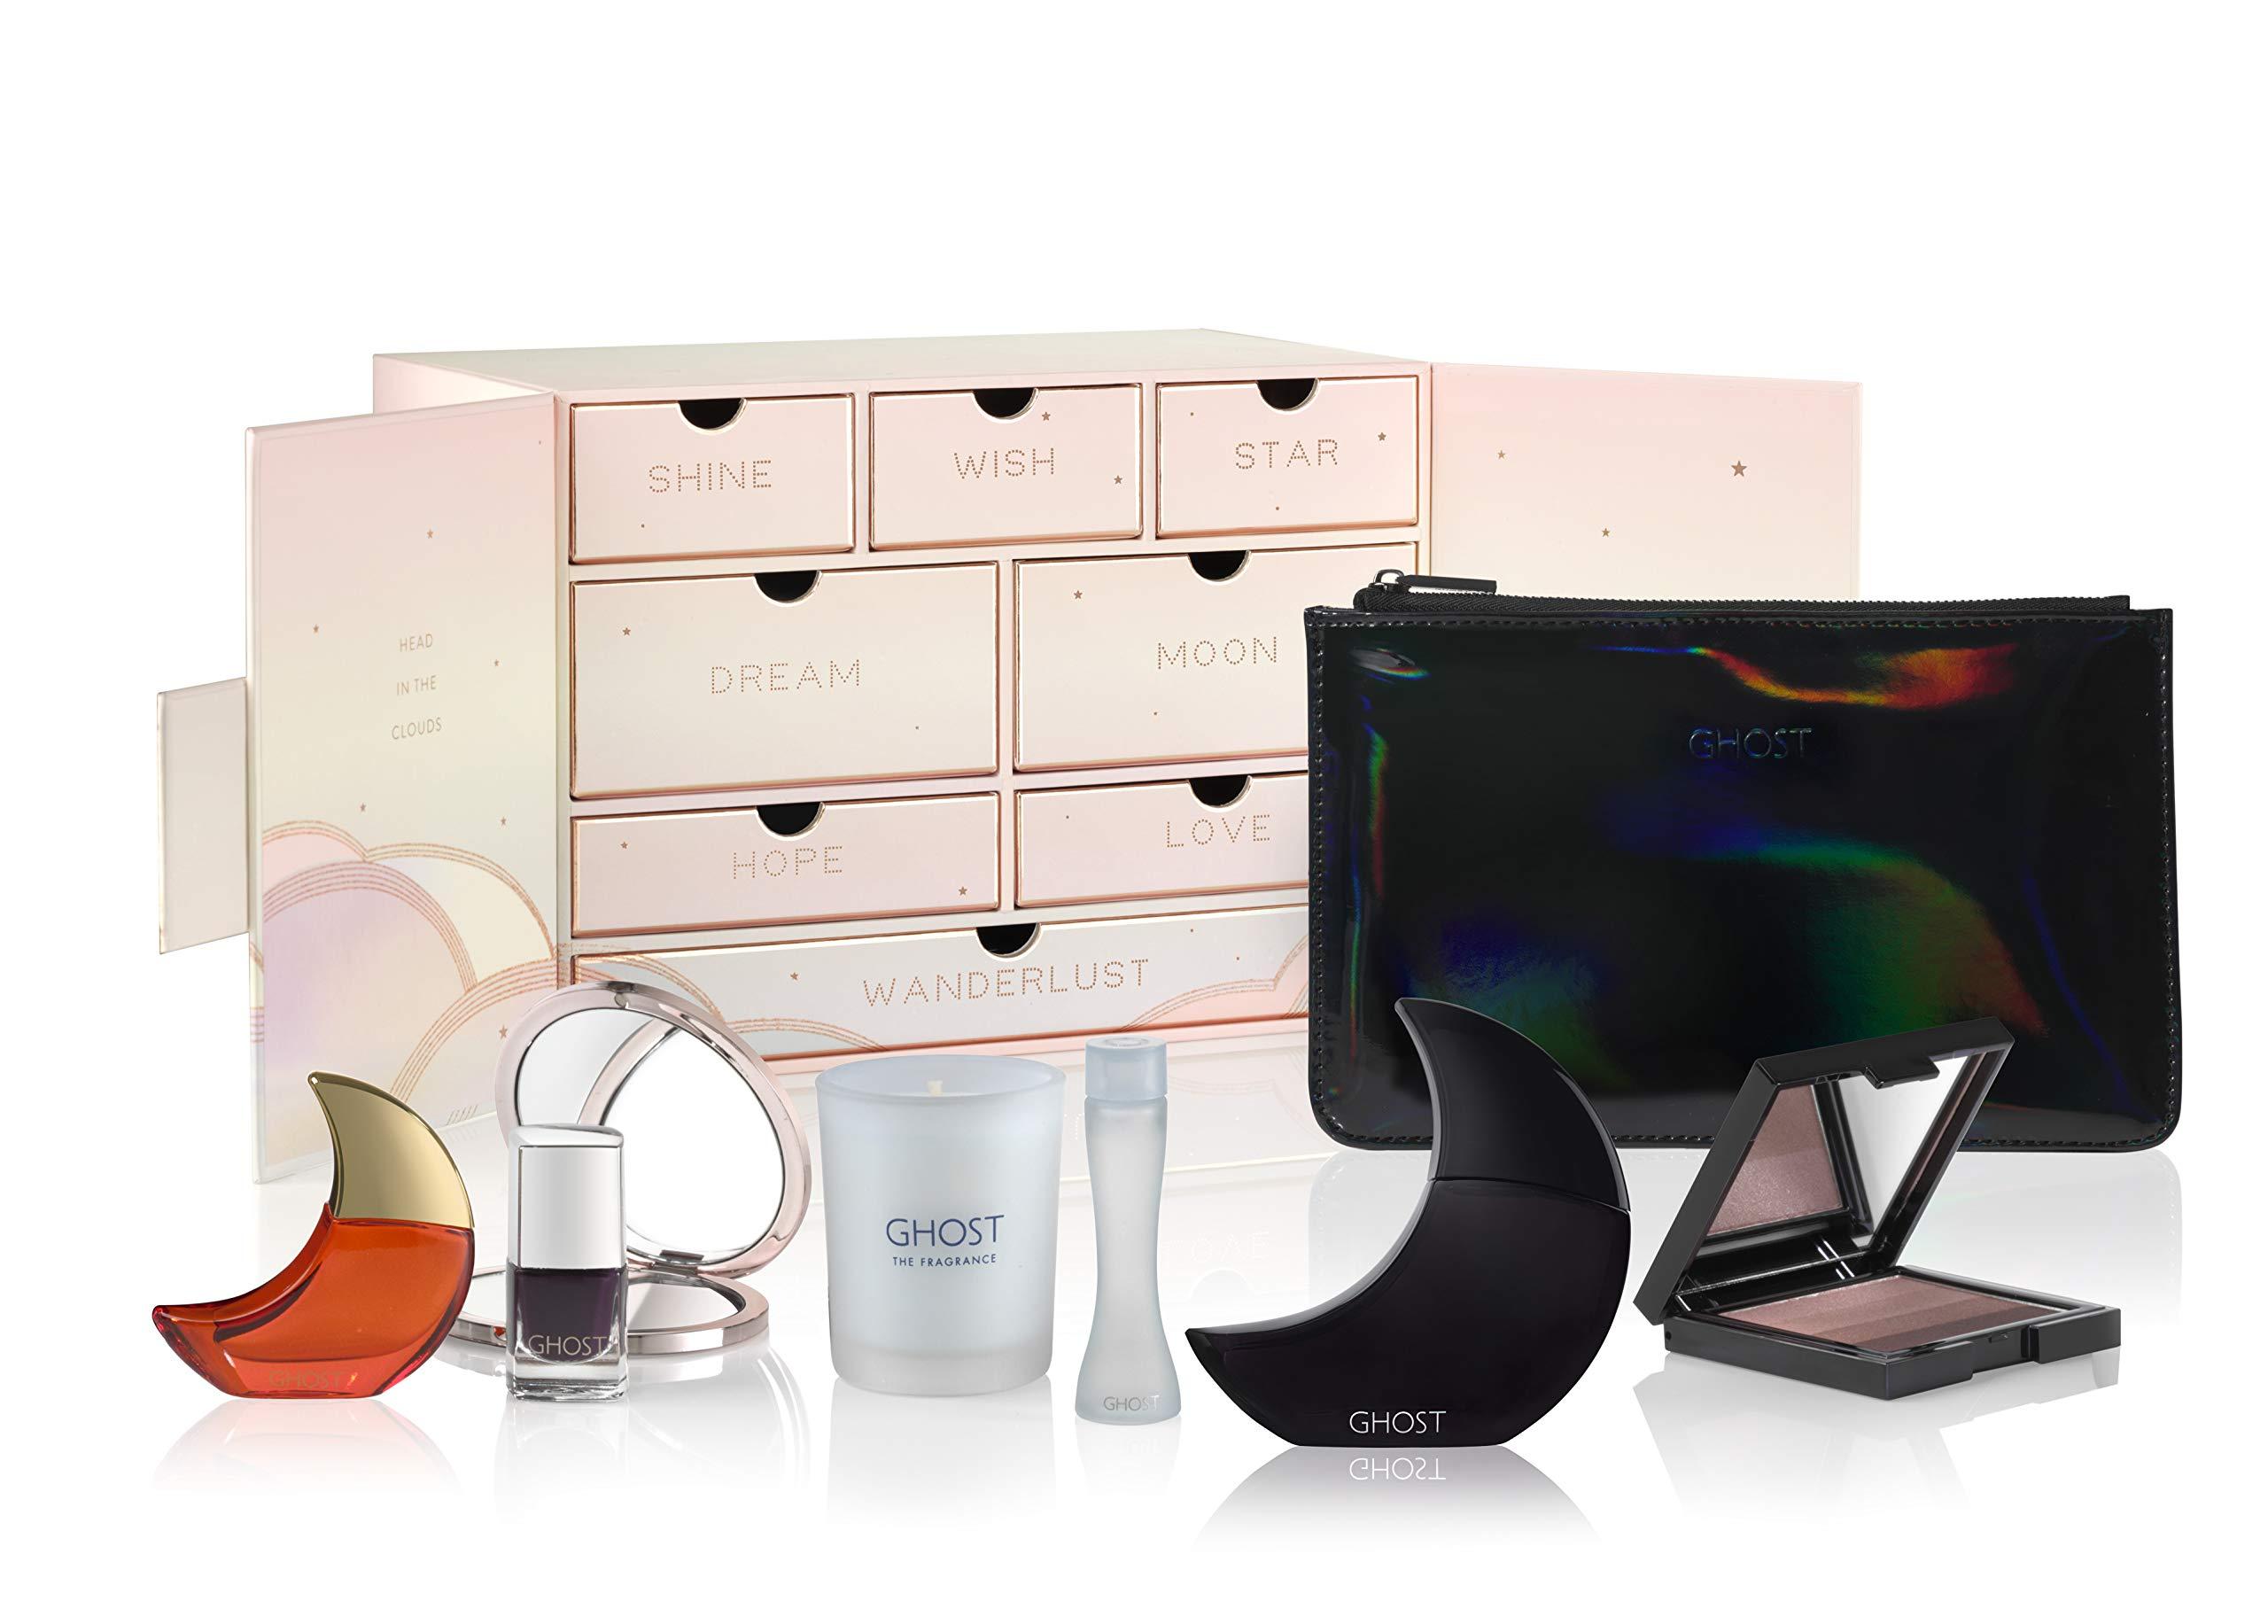 GHOST Beauty Box/Draw Set